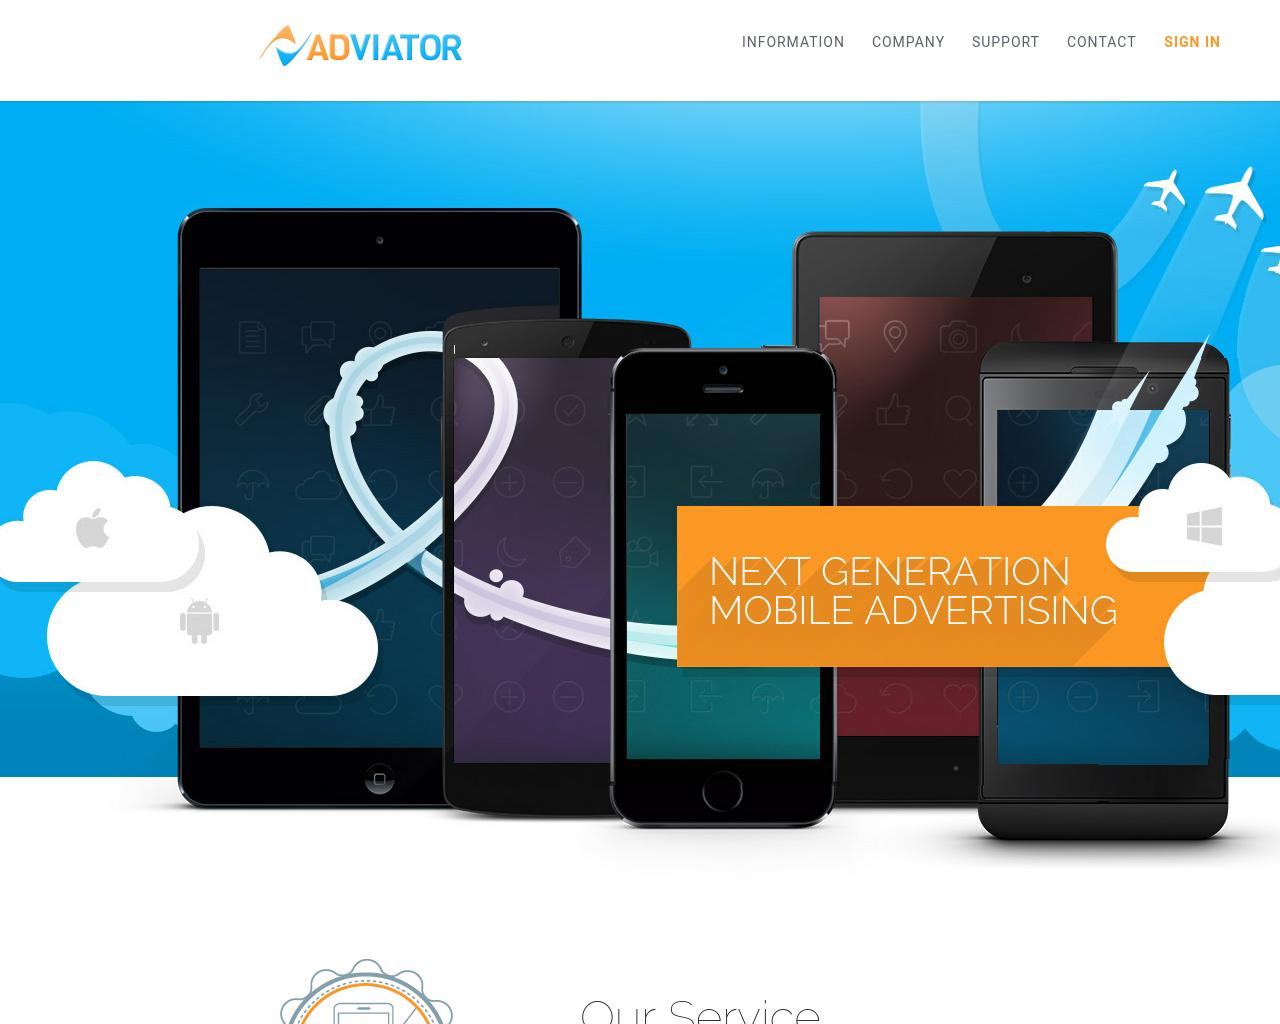 Adviator-Advertising-Reviews-Pricing